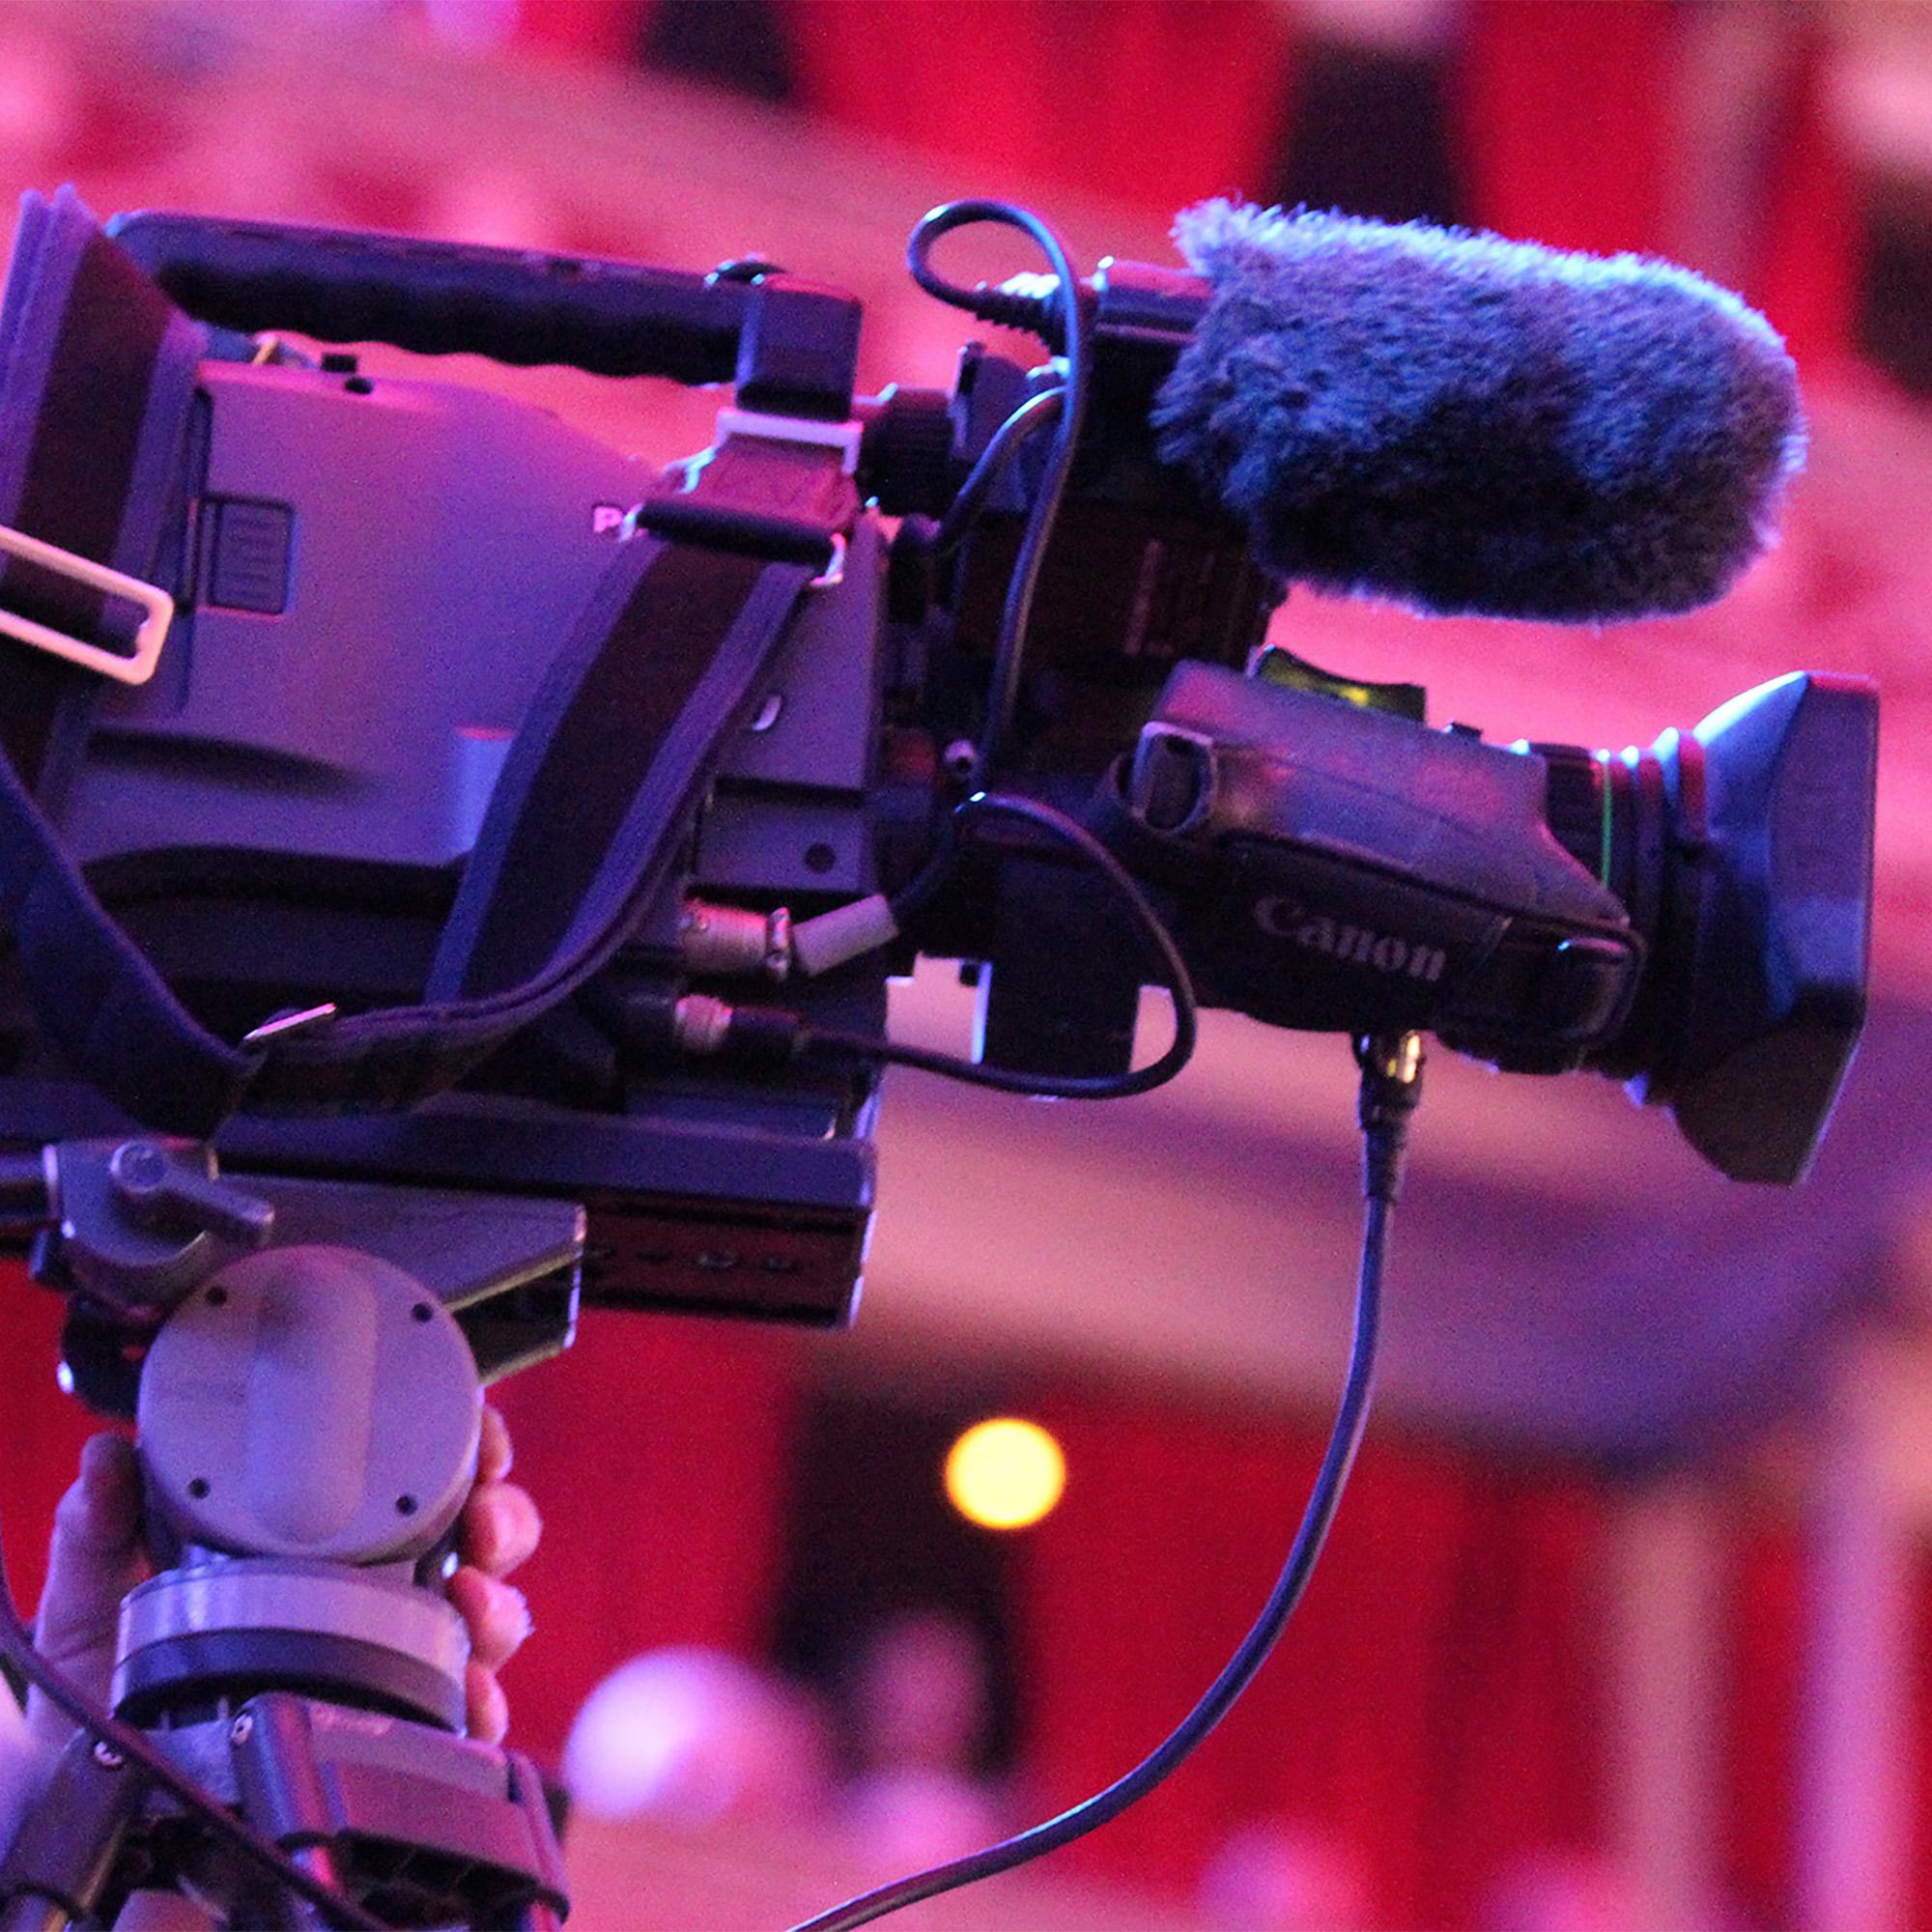 R&W Installation of audio camera mounts